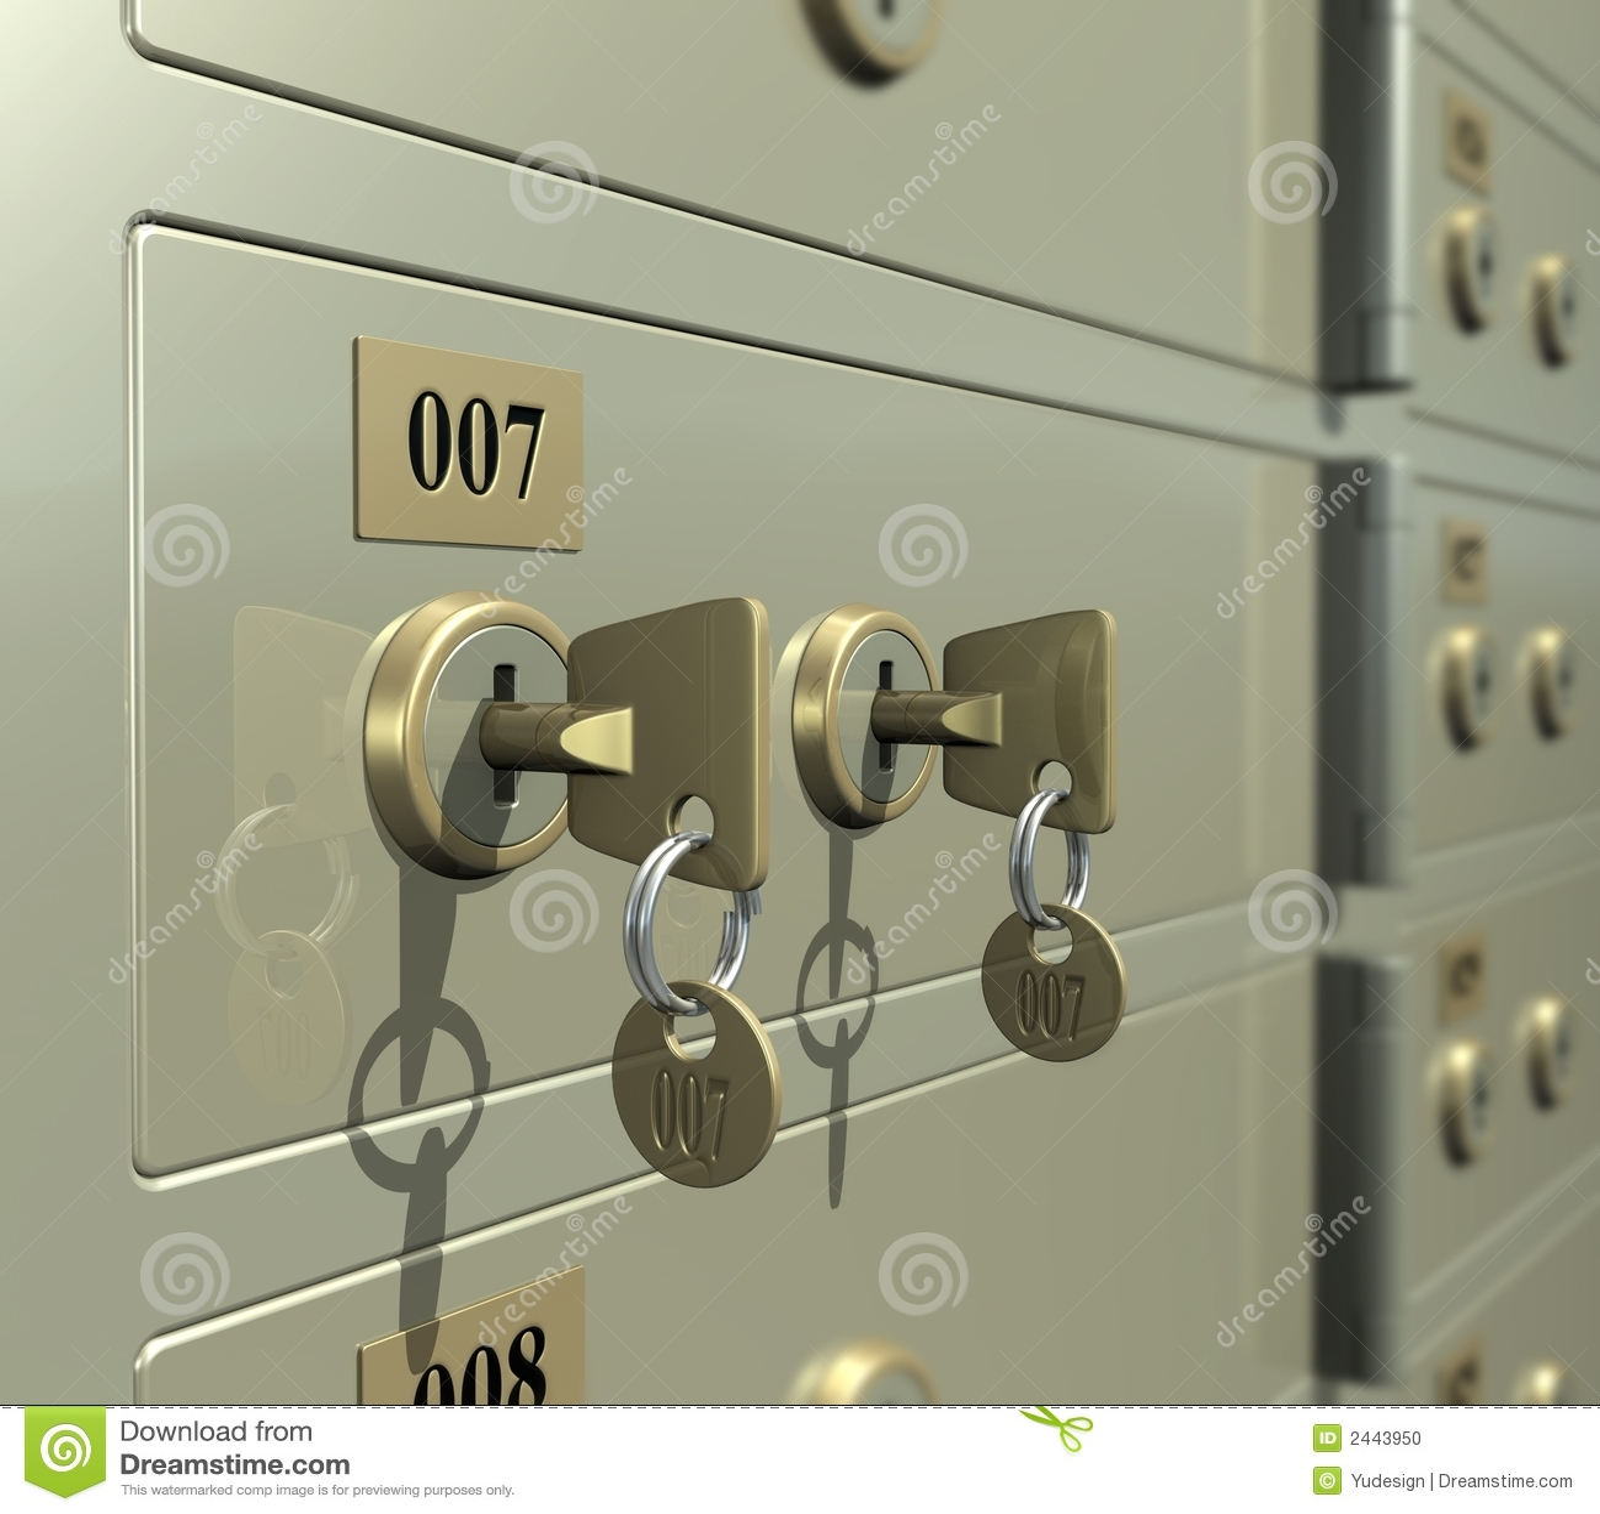 safe-deposit-box-2443950.jpg